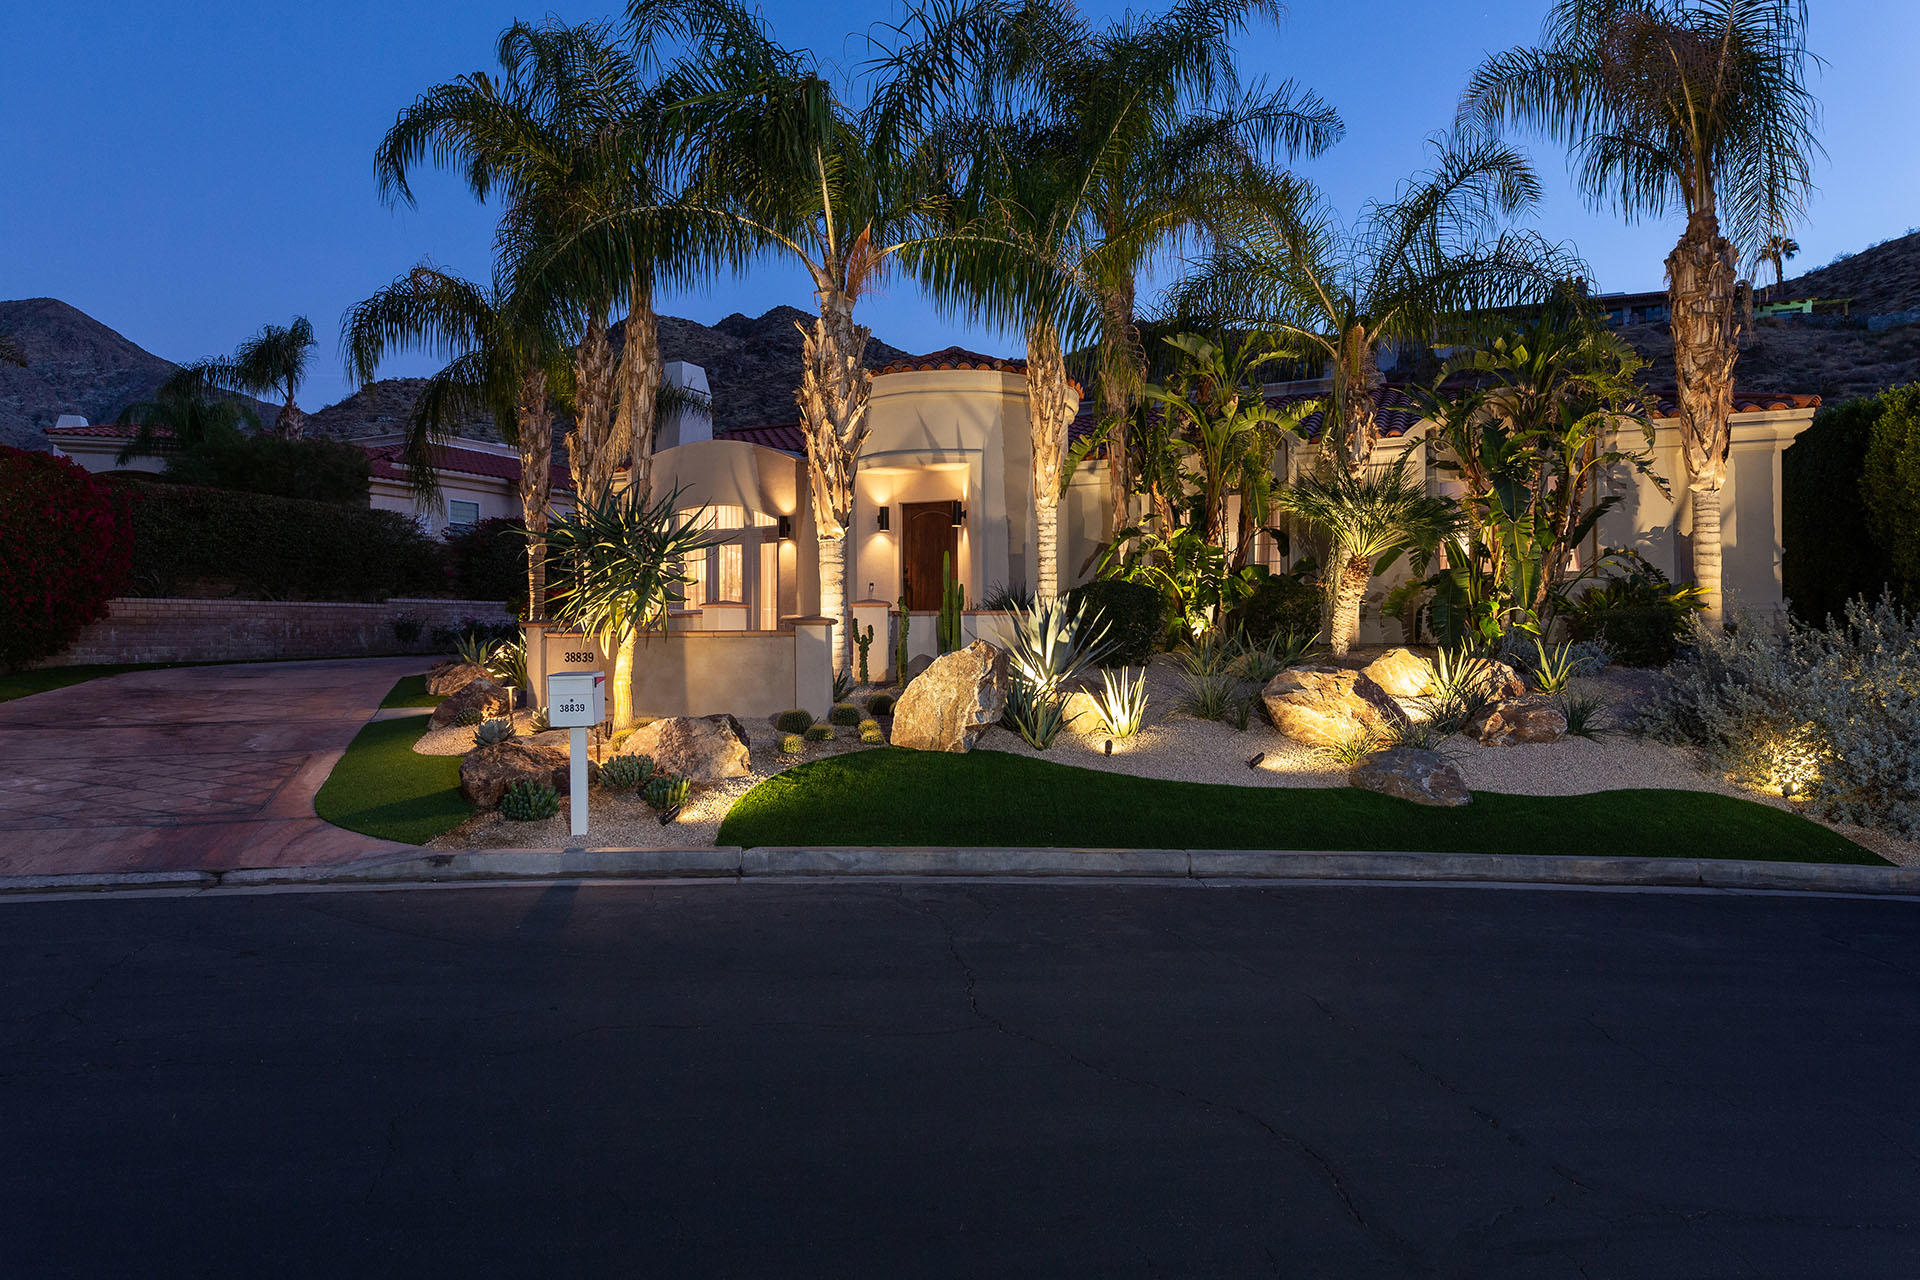 Photo of 38839 Maracaibo Circle, Palm Springs, CA 92264